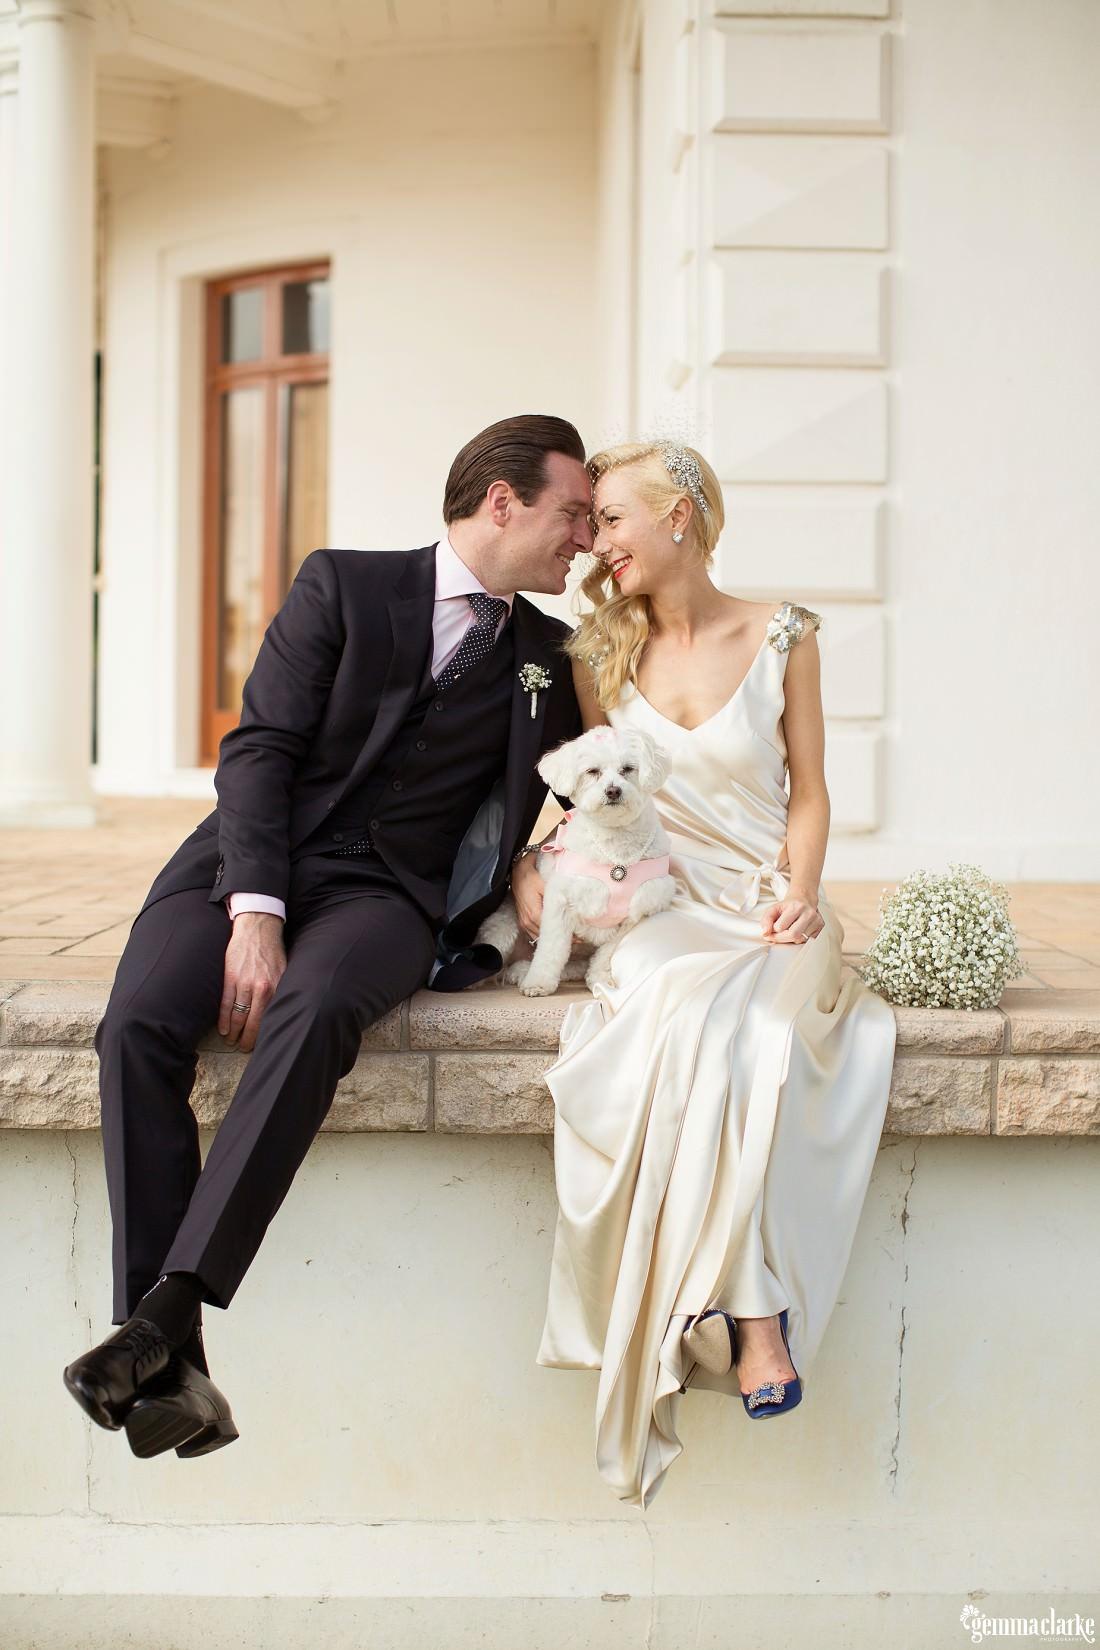 gemma-clarke-photography_watsons-bay-wedding_dog-bridesmaid_kristyl-and-ben_0055